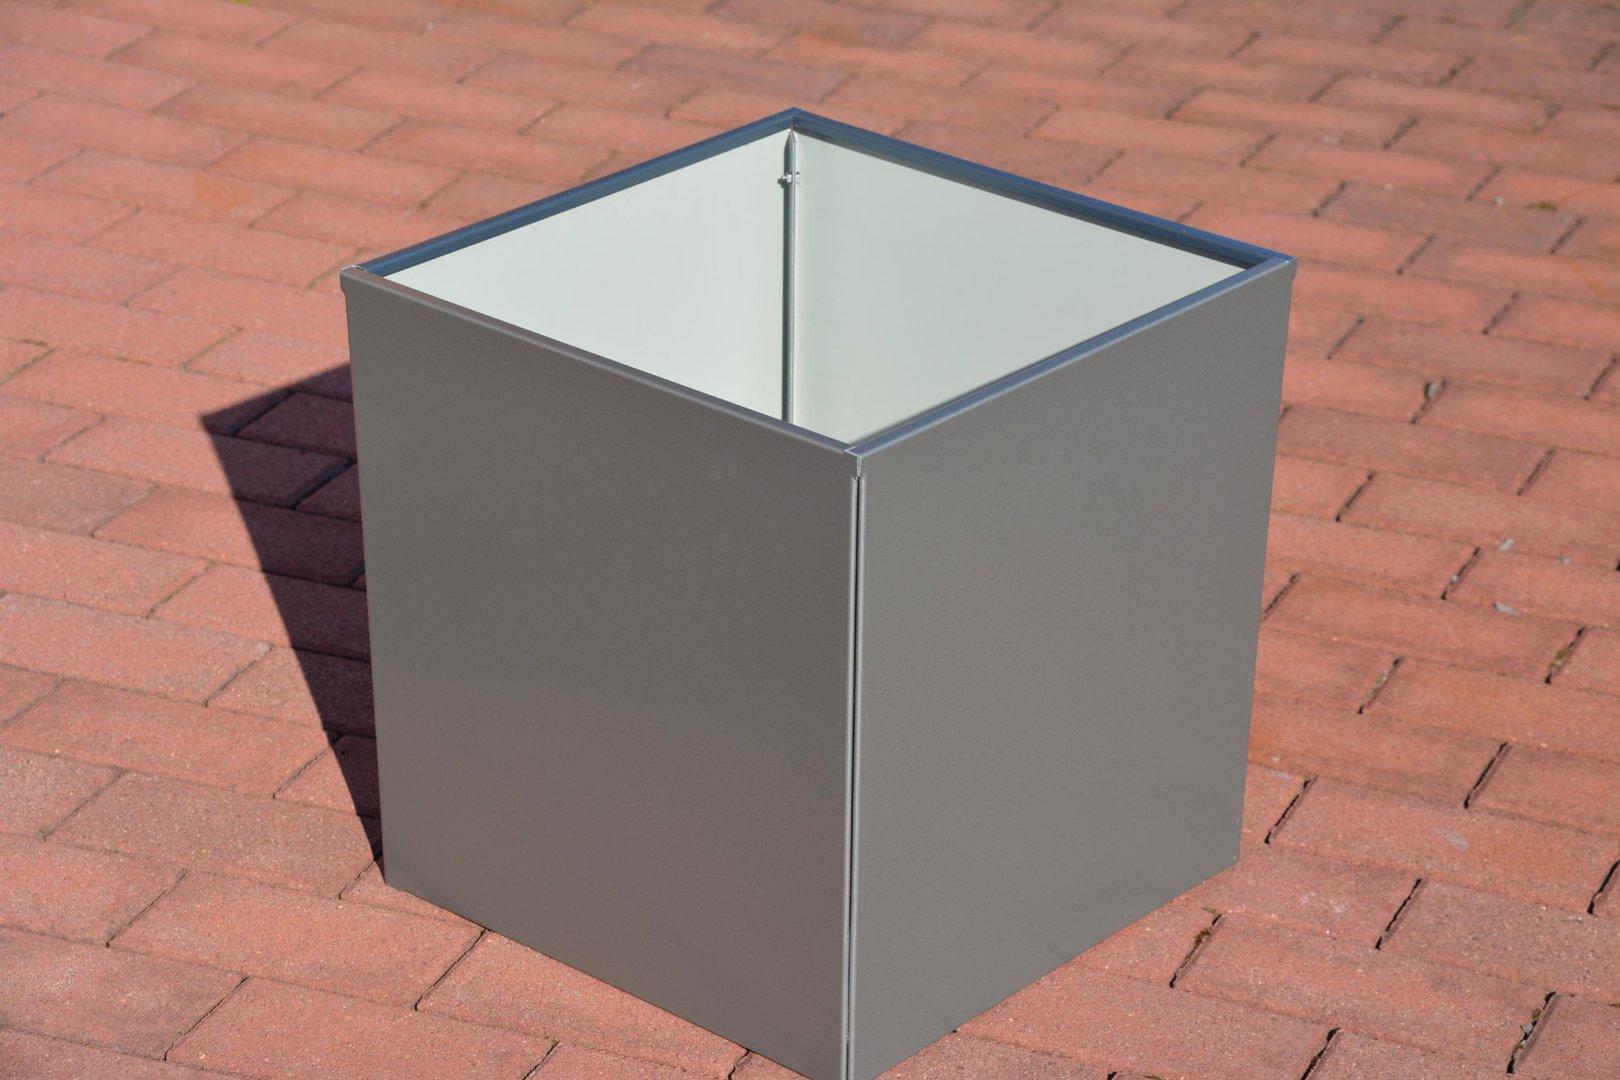 pflanztopf bertopf 60 x 60 x 45 cm lackiert. Black Bedroom Furniture Sets. Home Design Ideas